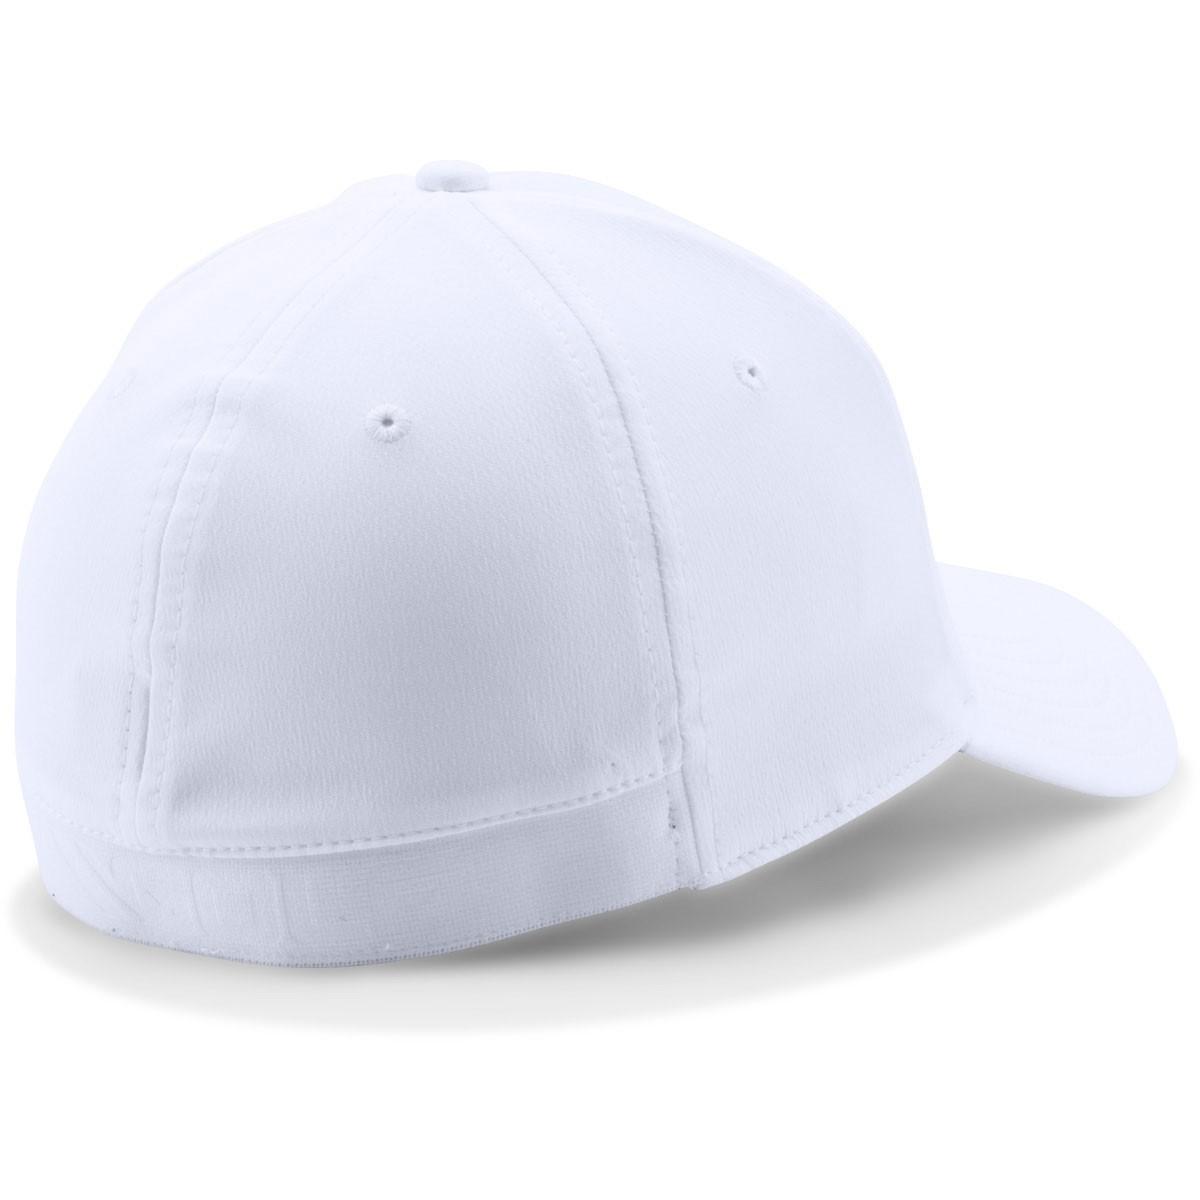 f0c19549bcb Under Armour Mens UA Golf Headline Cap - Golf Headwear - Men - Golf